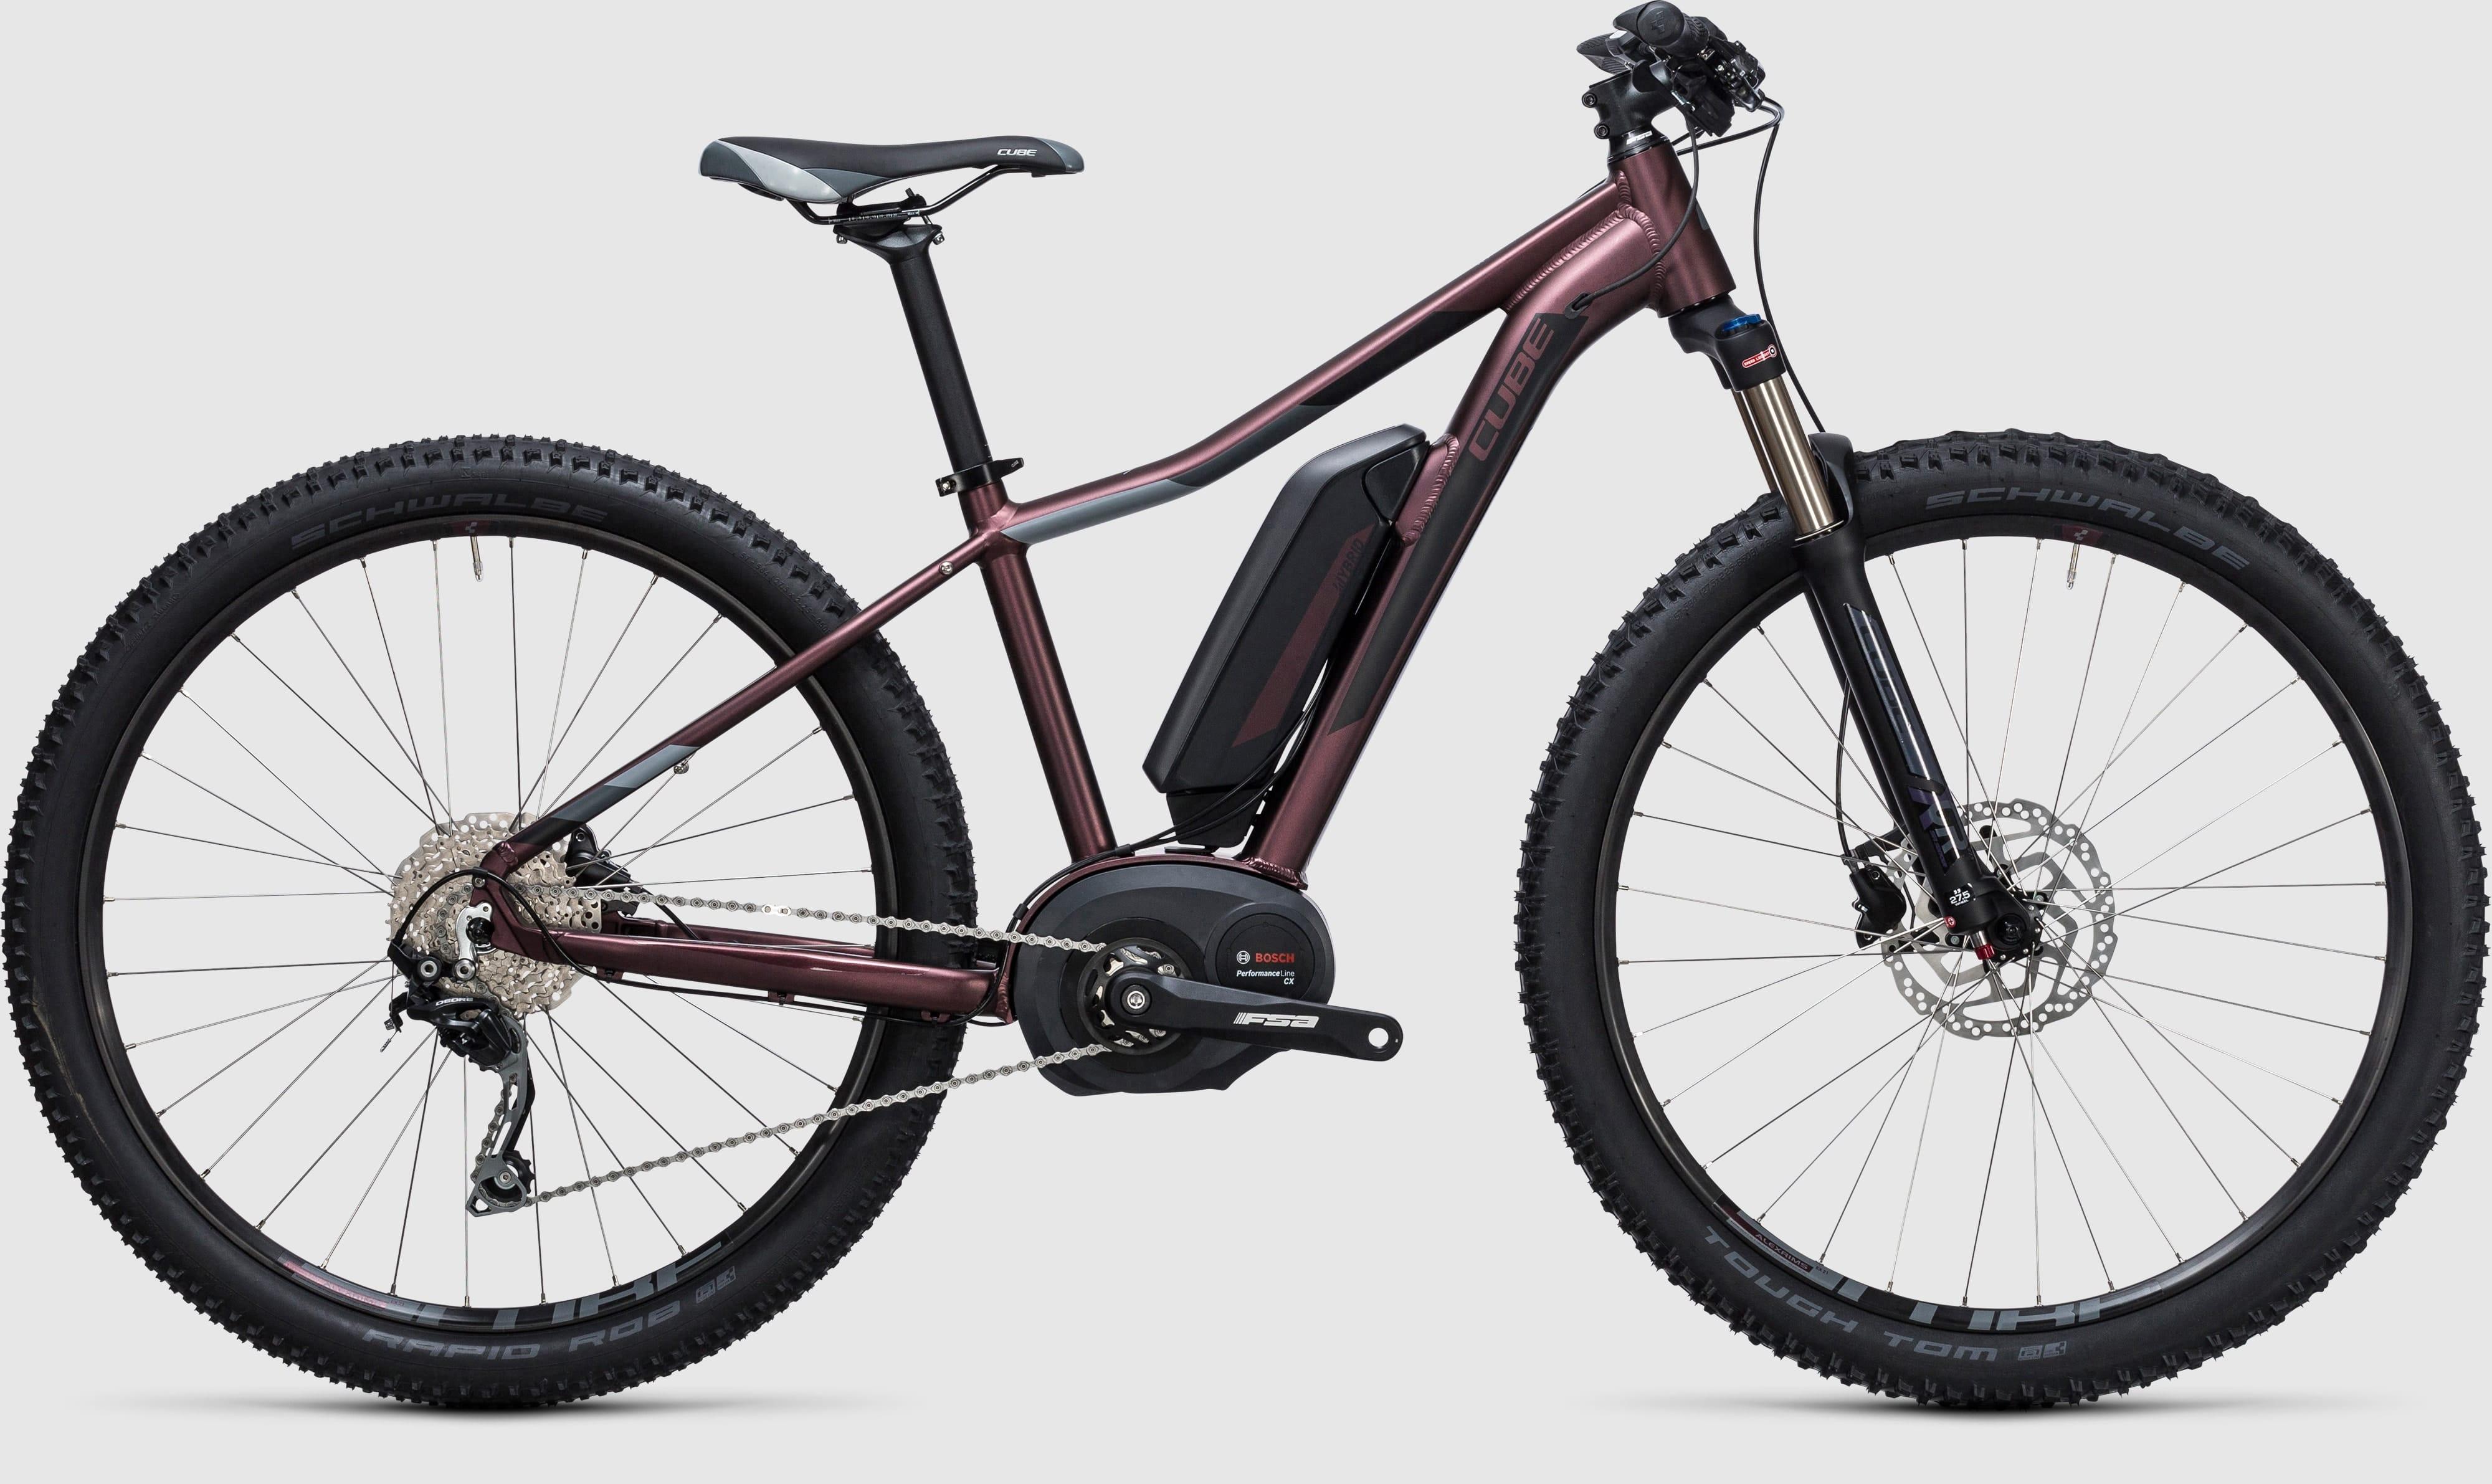 cube access wls hybrid pro 400 29 hardtail e bike 2017. Black Bedroom Furniture Sets. Home Design Ideas